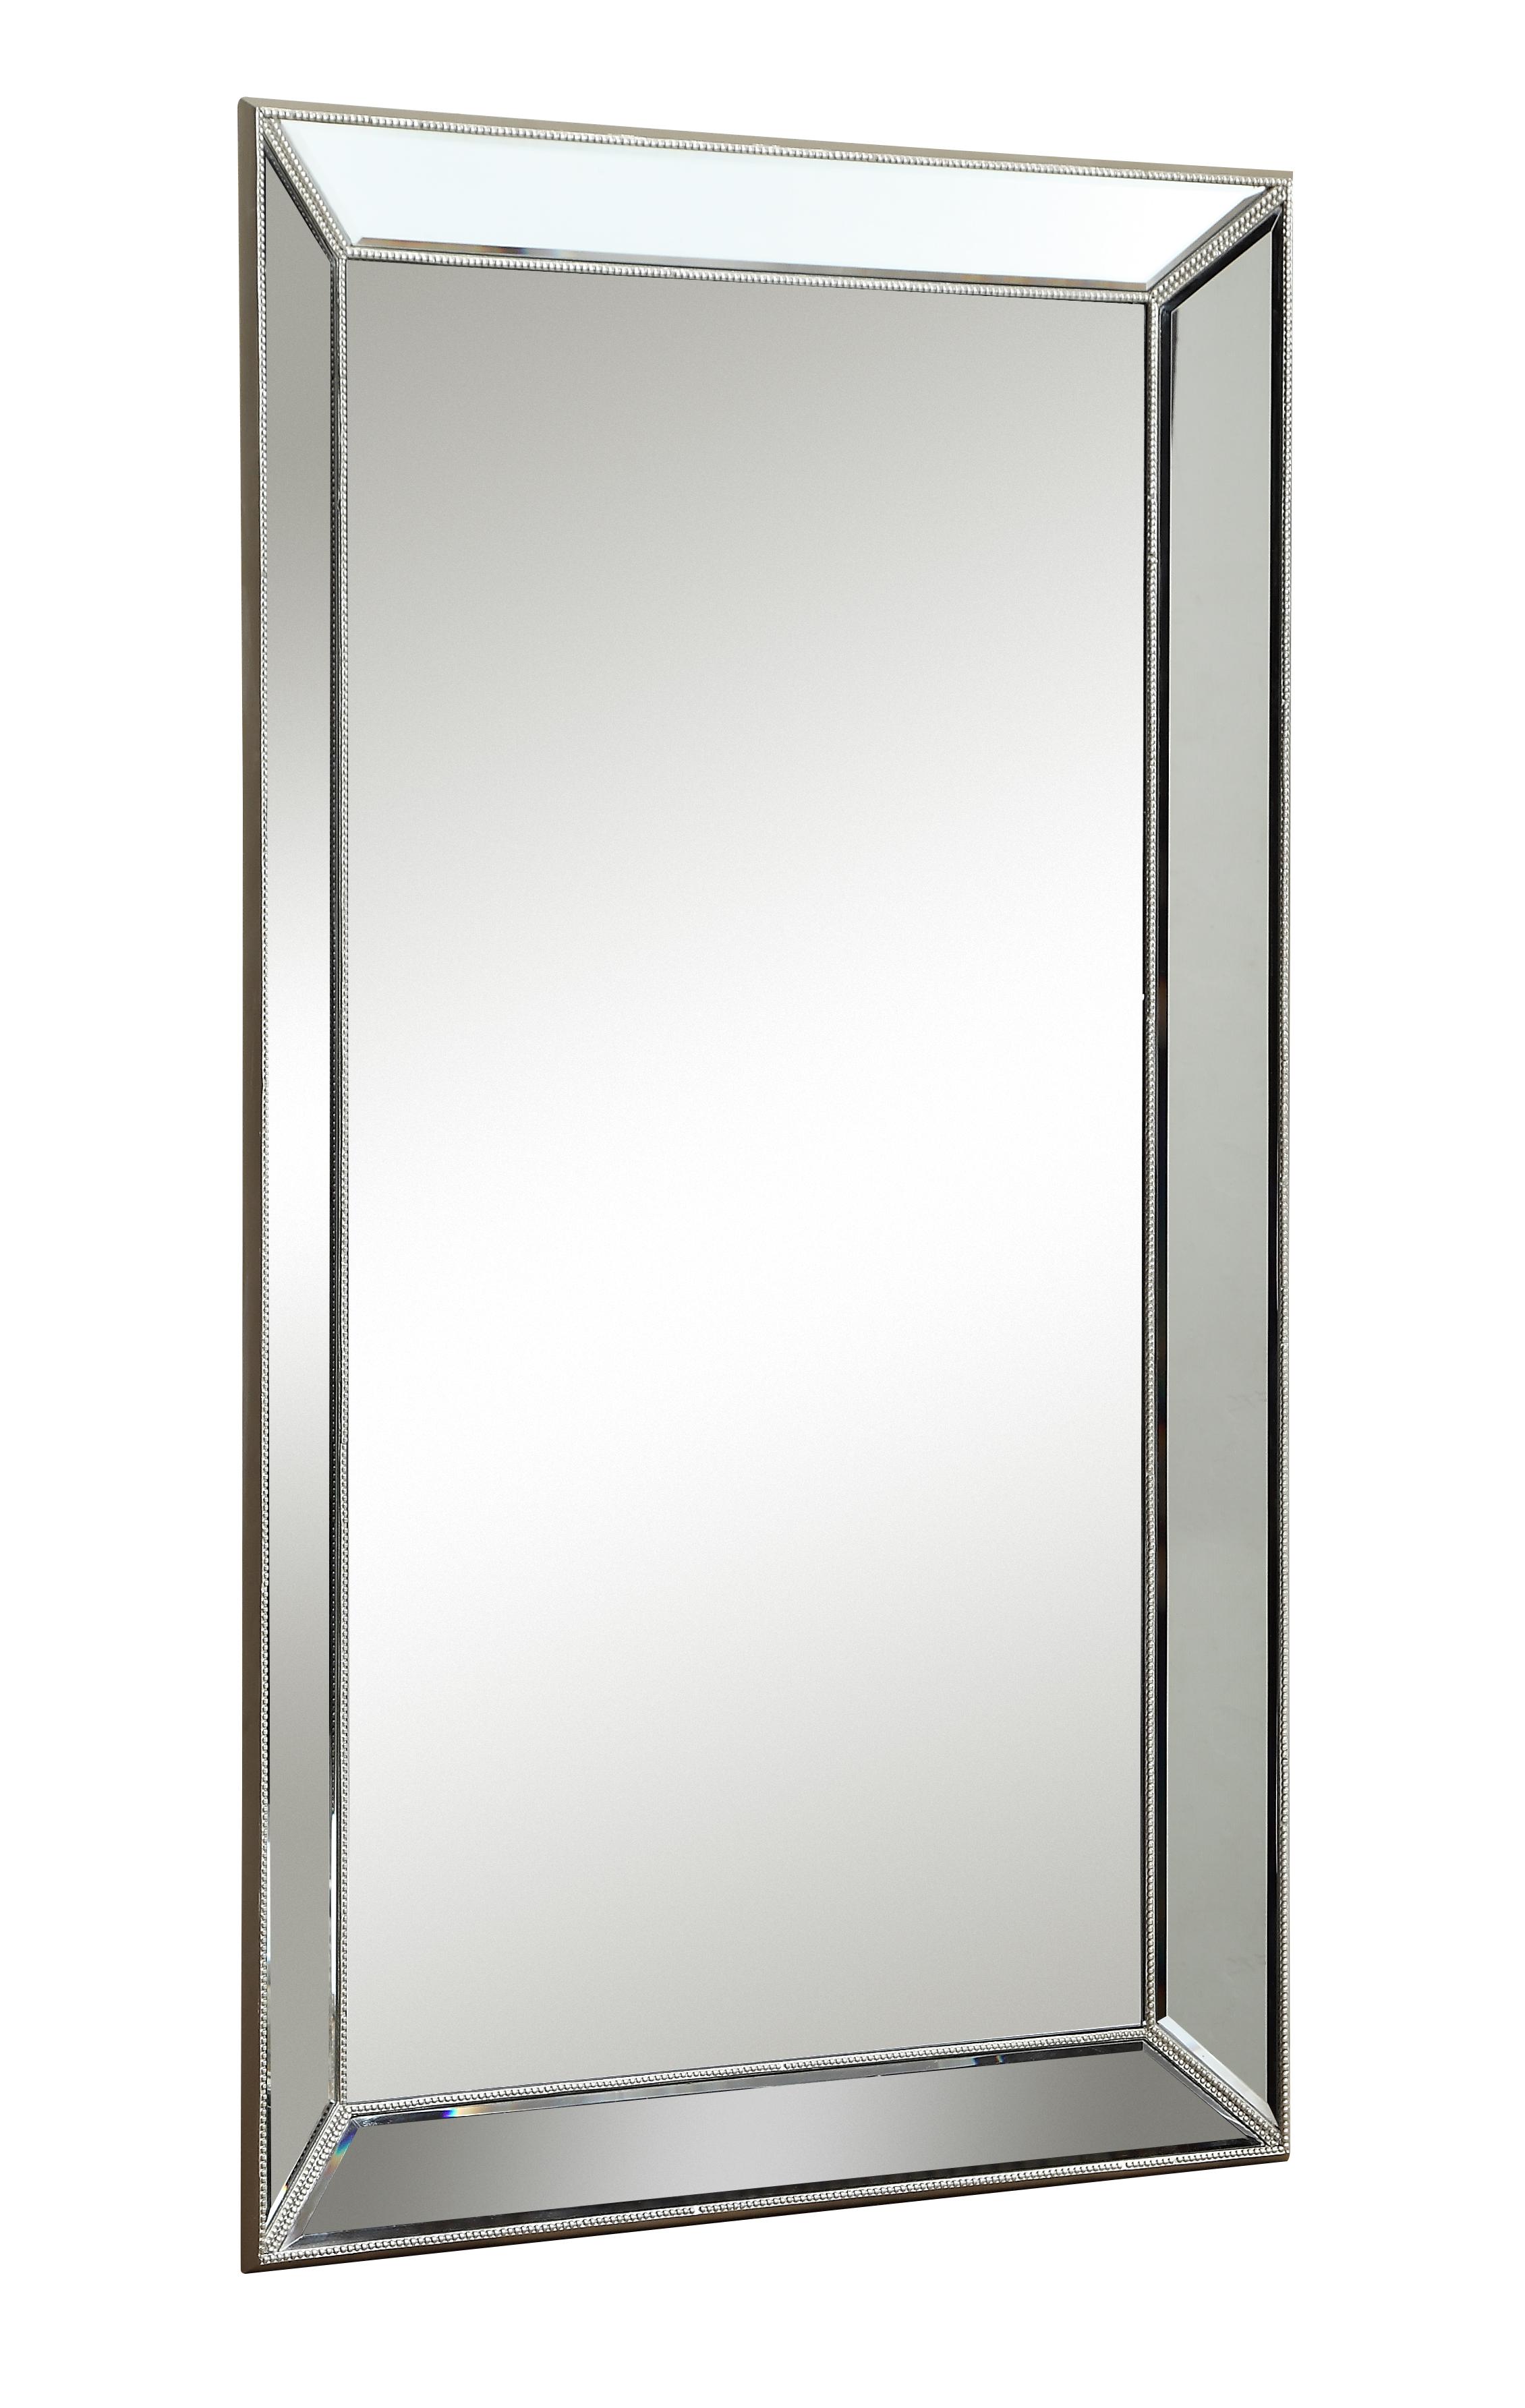 Coast to Coast Accents Rectangular Floor Mirror by Coast to Coast Imports at Bullard Furniture